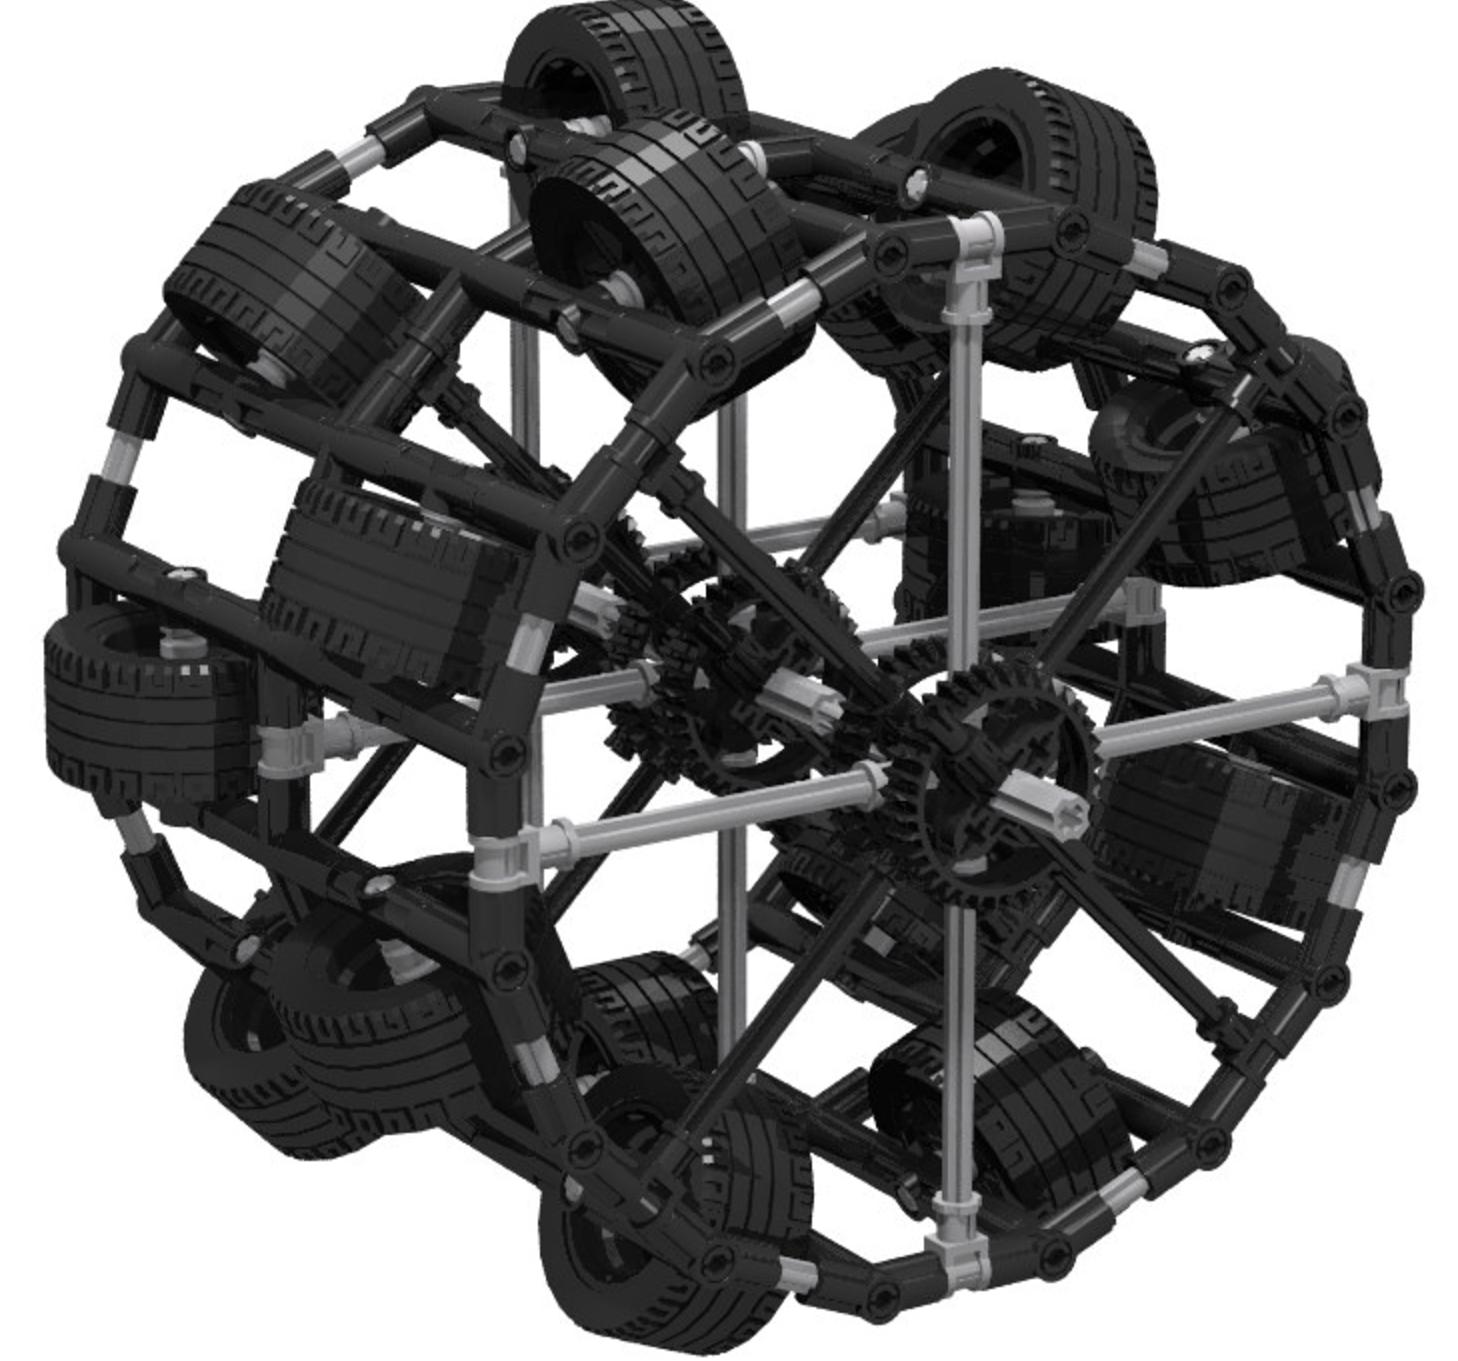 mindstorms,robot,power,technic,large,nasa,car Lego EV3 Medium Servo Motor